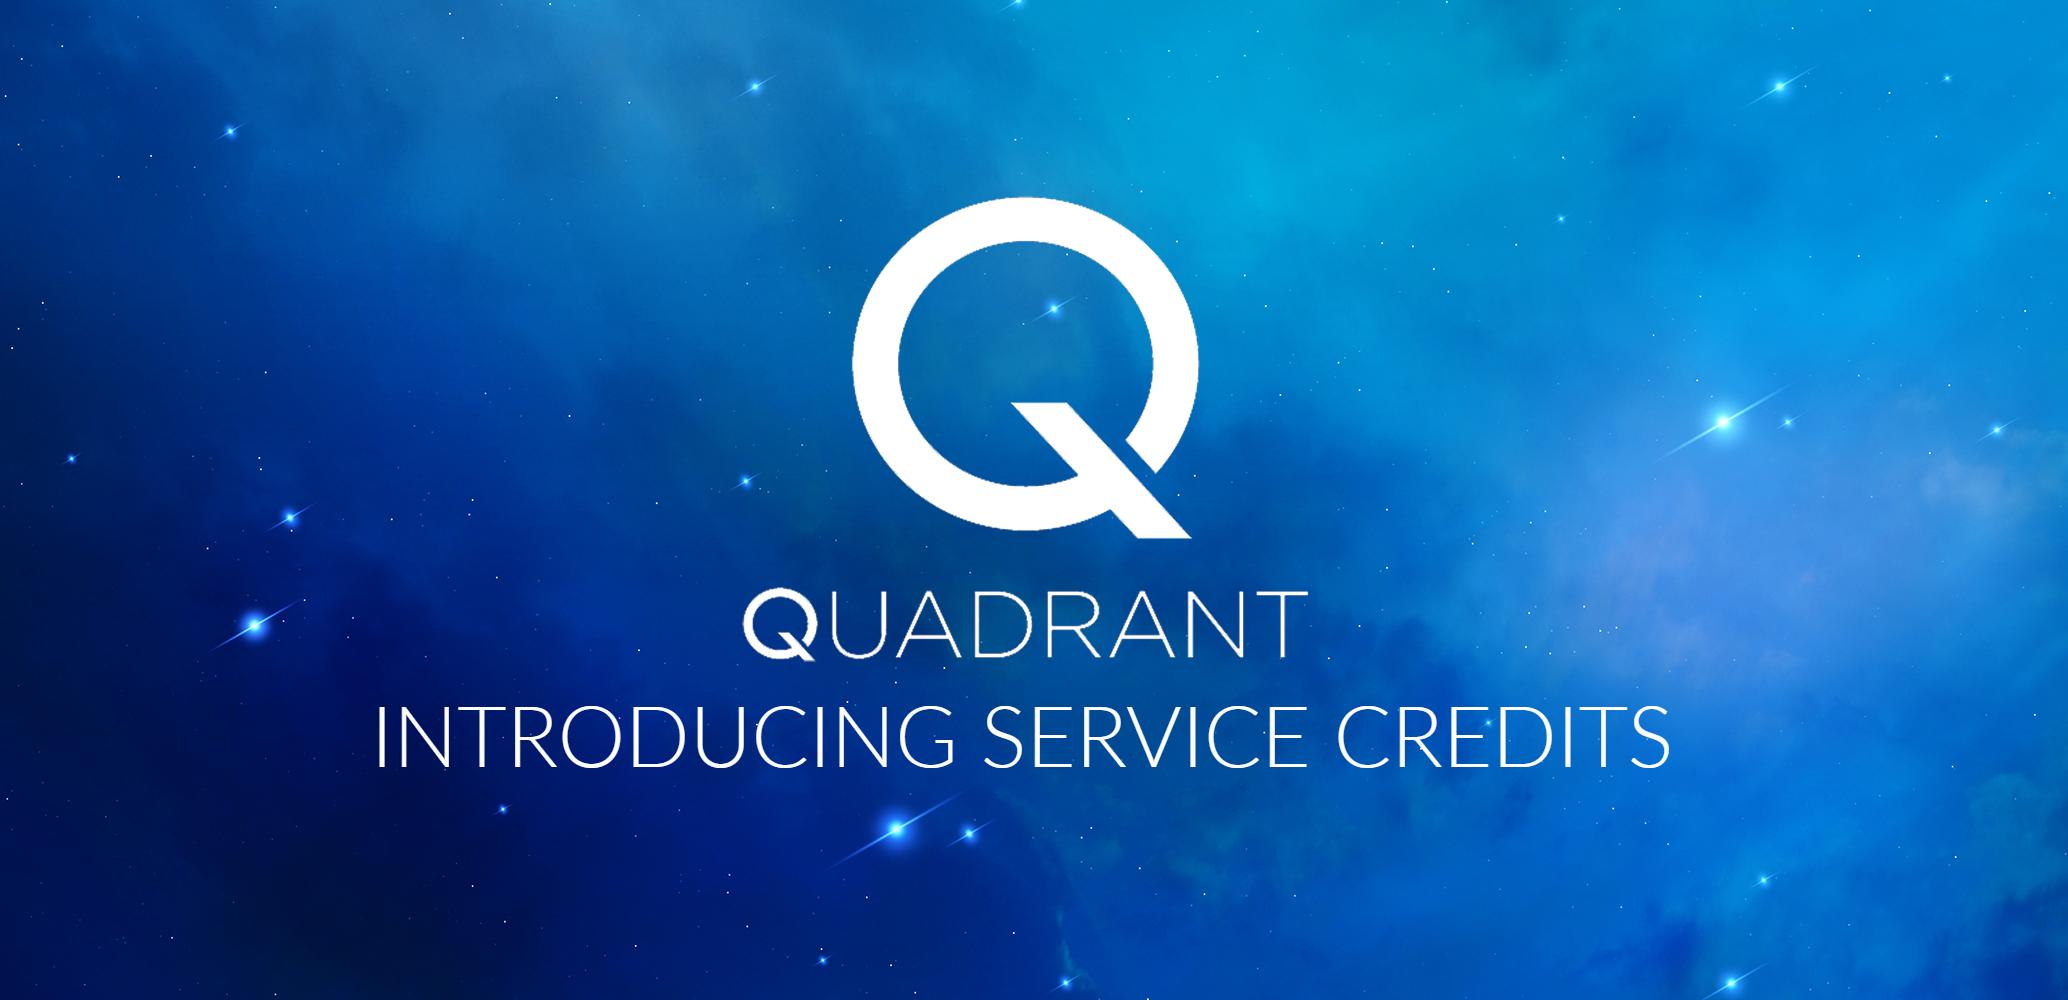 MediumArticle - Service Creditsv2-1